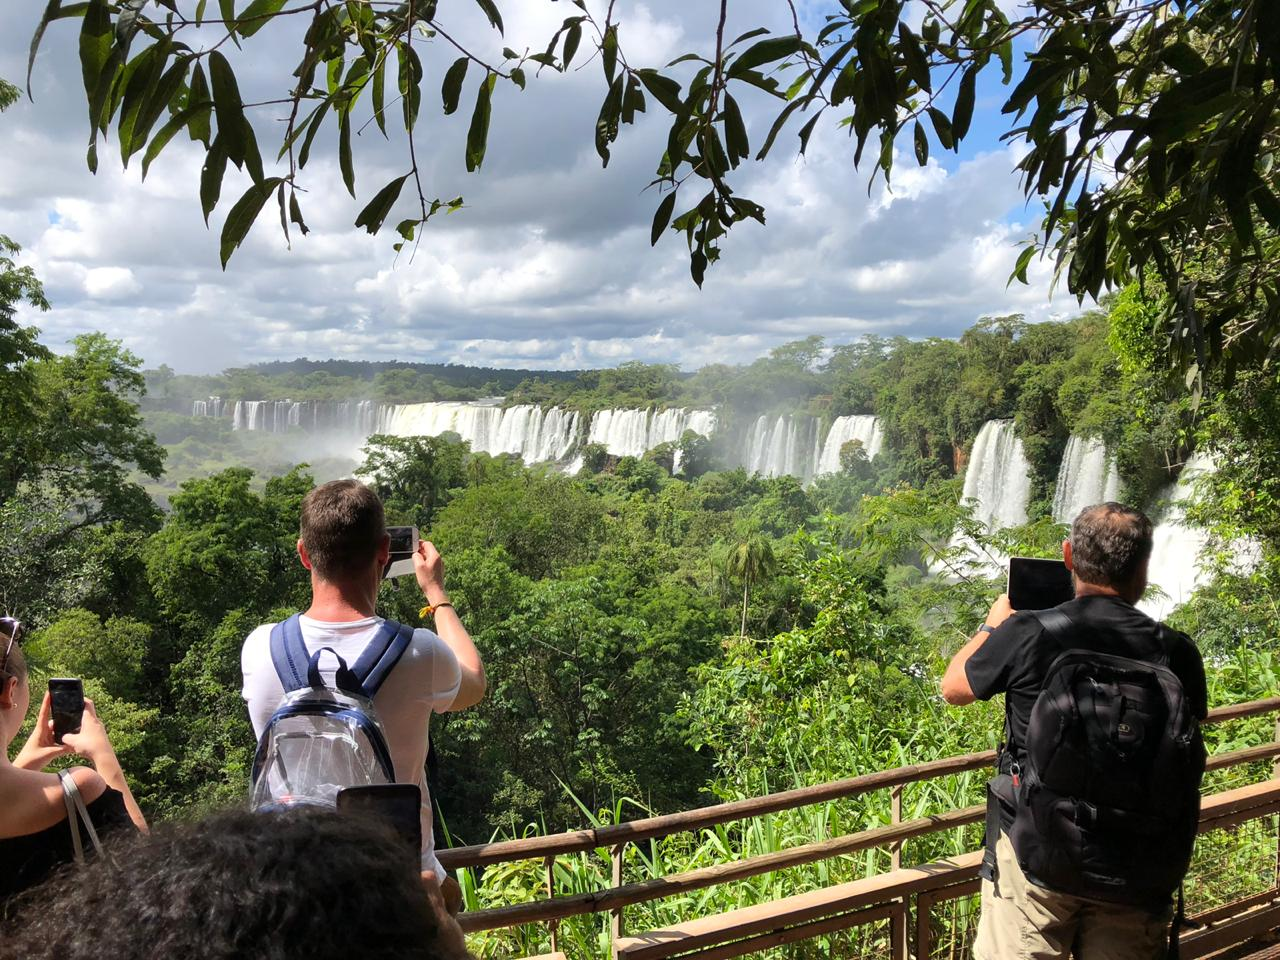 FOZ COMBO 2 - Arriving Foz do Iguaçu / Staying in Foz do Iguaçu / Brazilian + Argentine Side of Falls / Departing Foz do Iguaçu